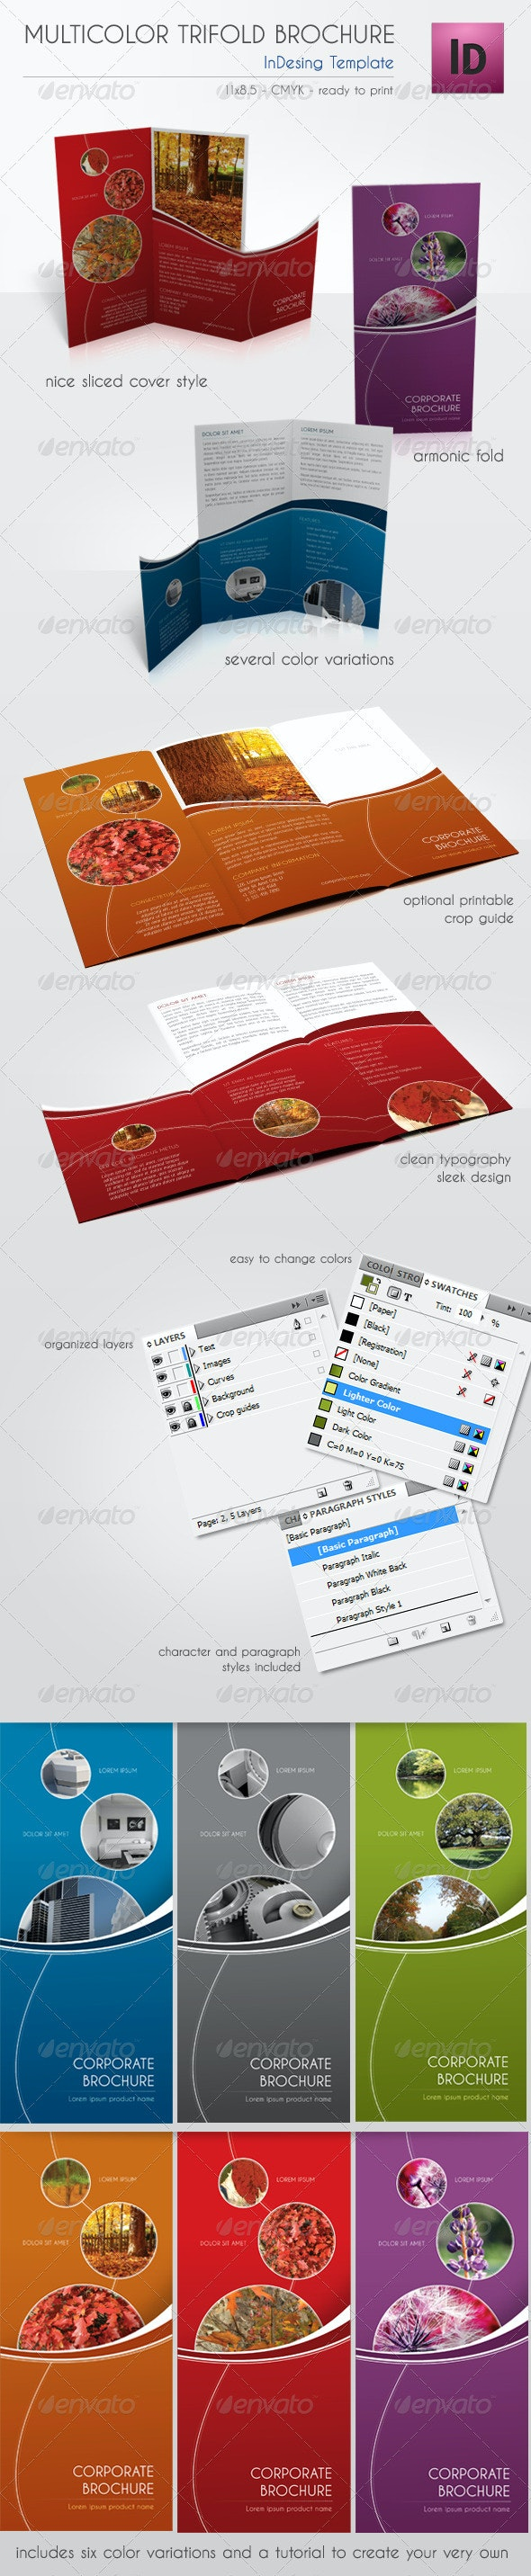 Multicolor Trifold Brochure - Corporate Brochures